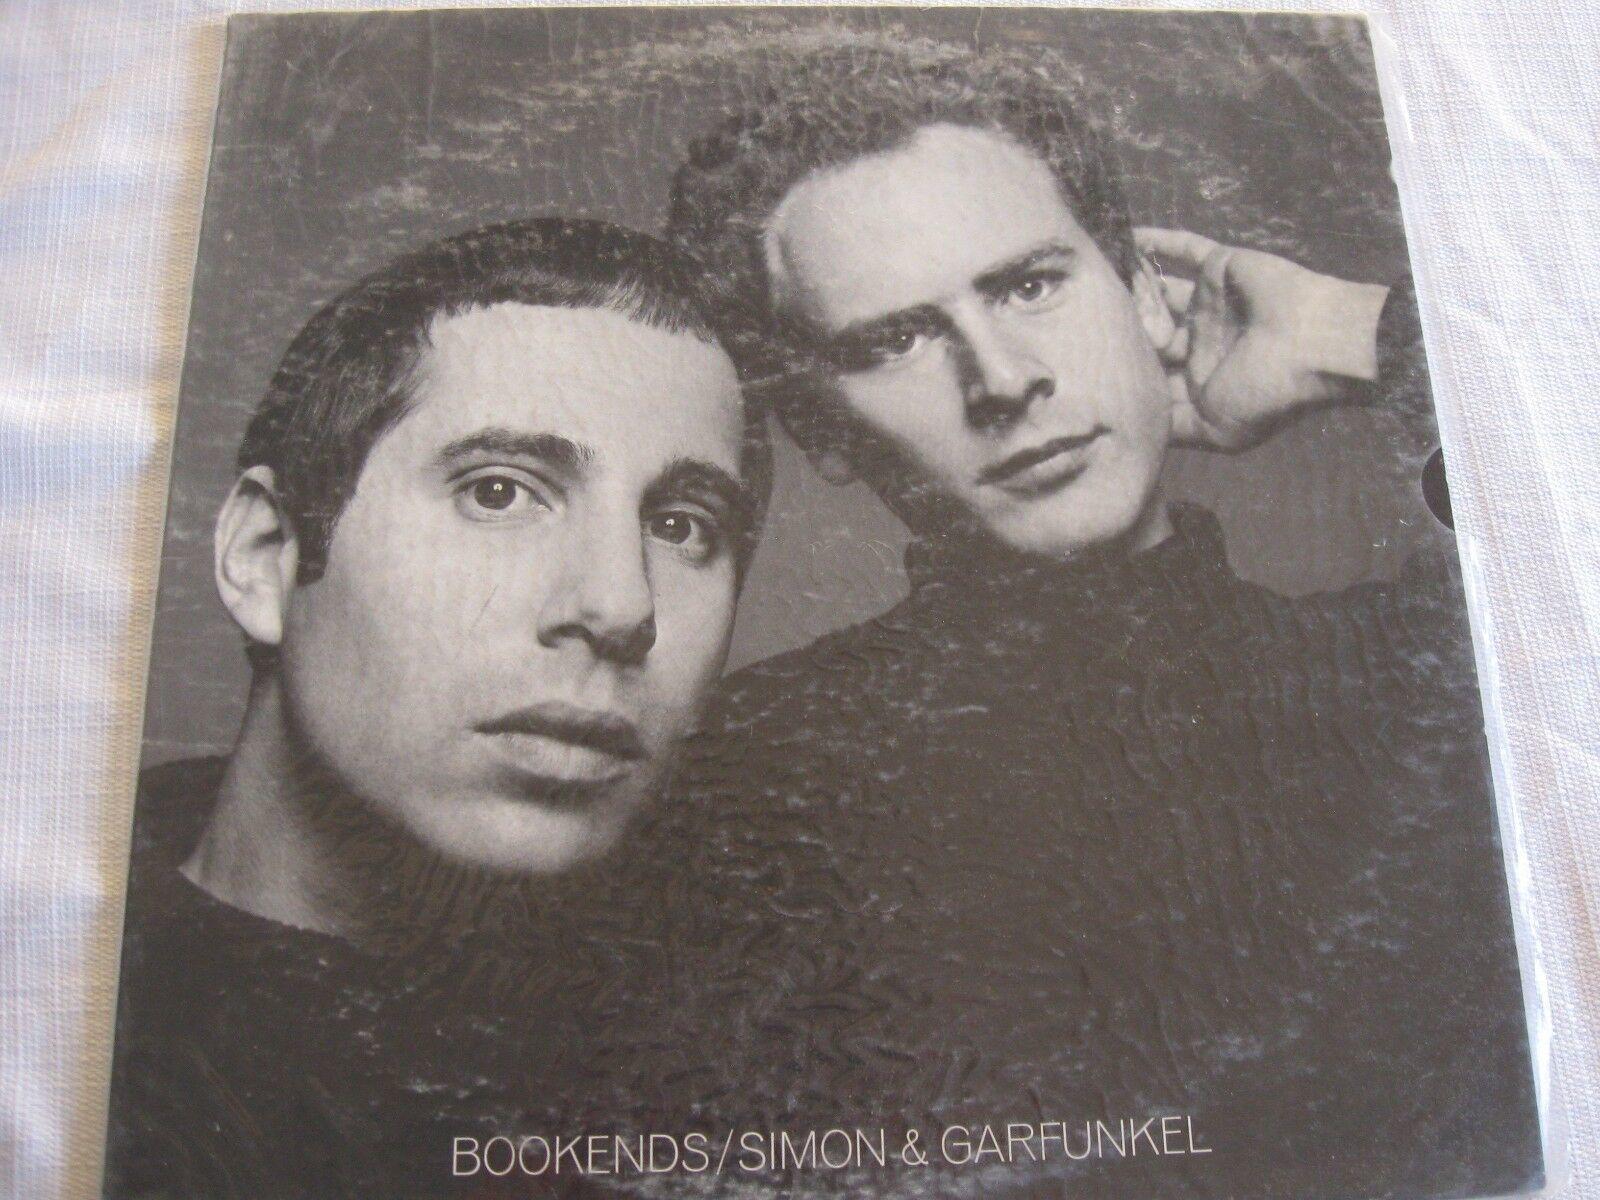 Simon & Garfunkel Bookends Columbia KCS 9529 Stereo 1A First Pressing